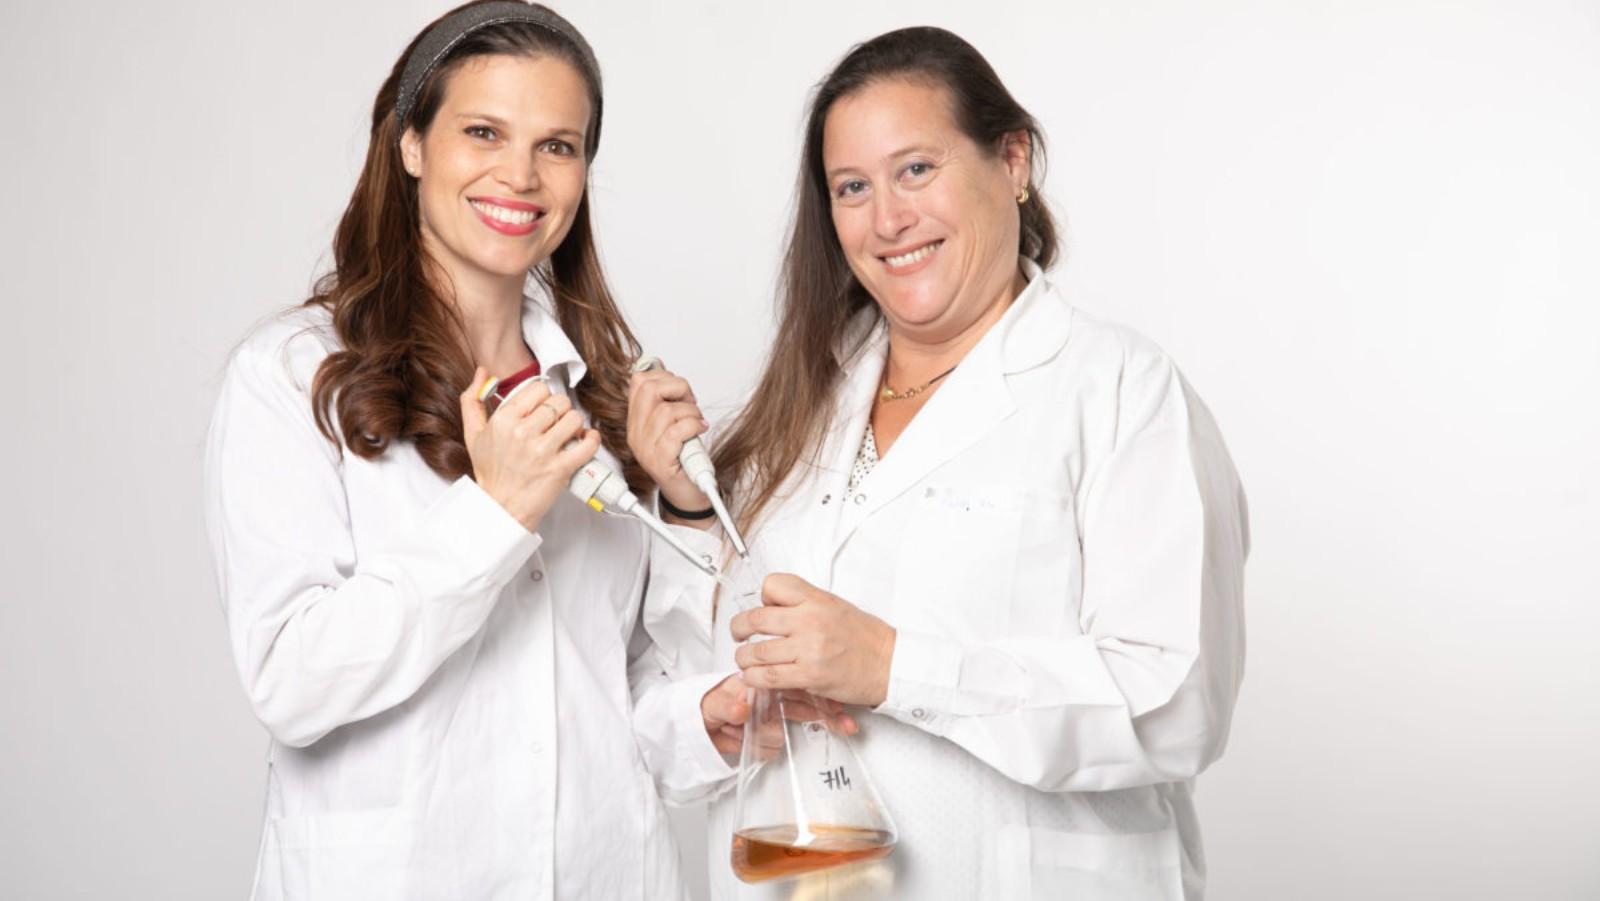 Rapid Test Checks Freshness And Vitamin Levels Of Breast Milk